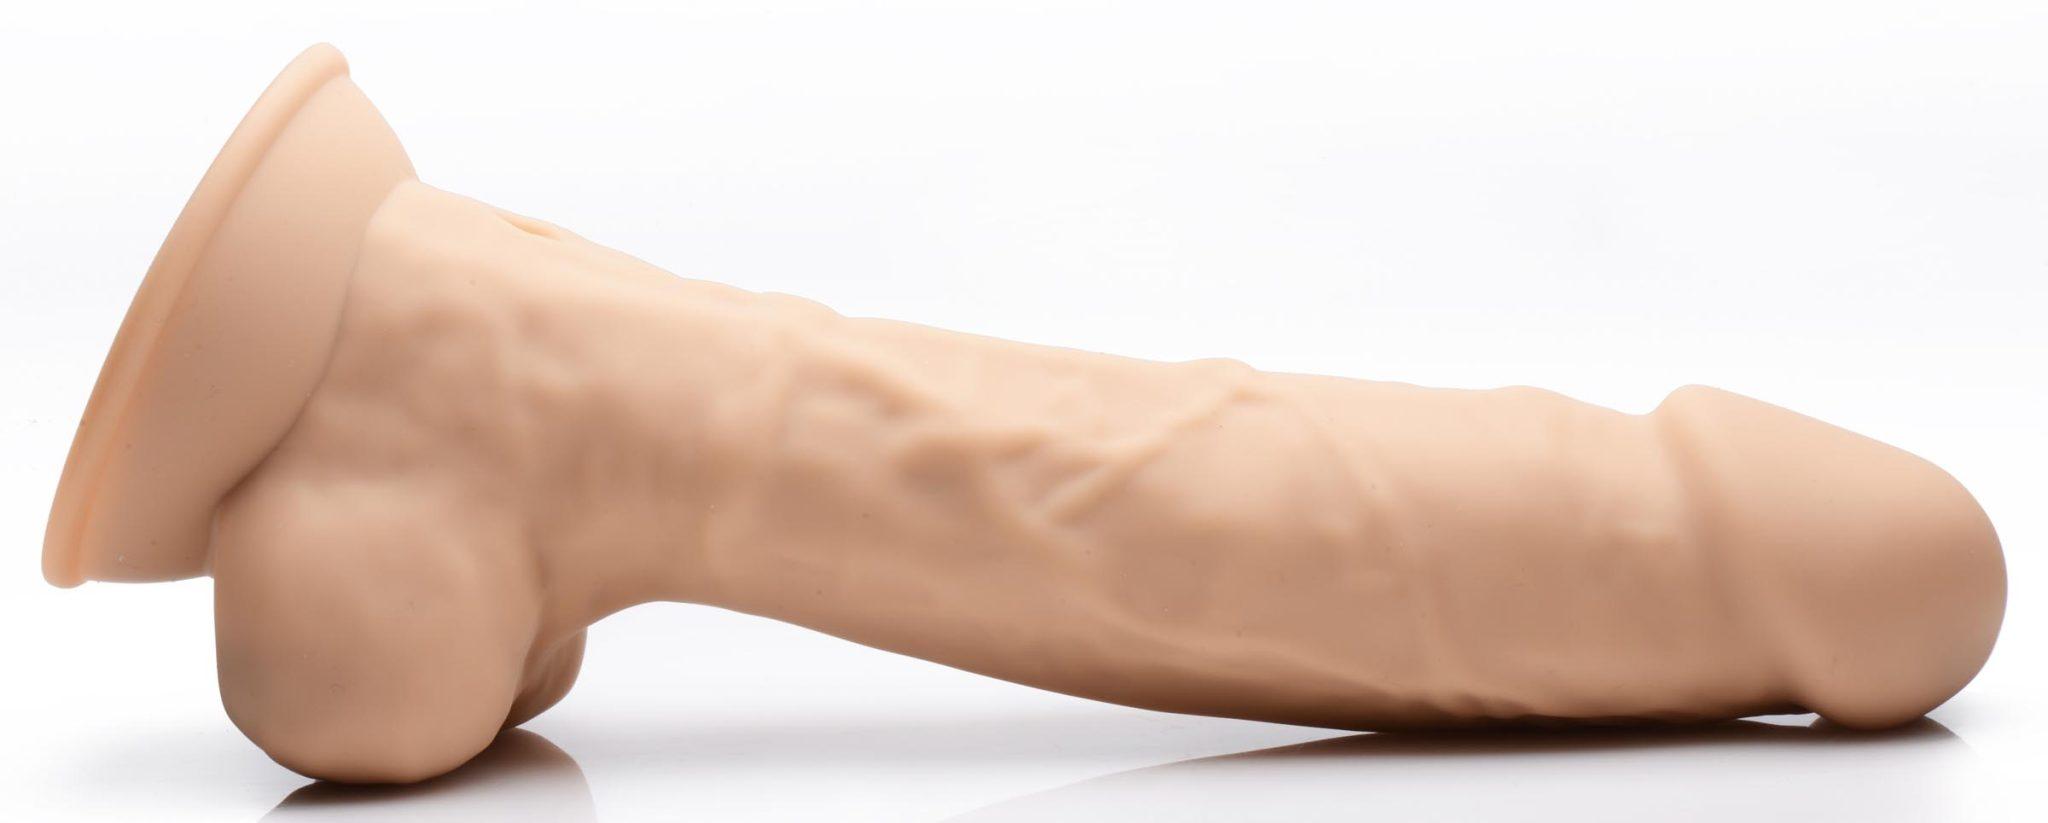 8 Inch Silexpan Hypoallergenic Silicone Vibrating Dildo – Medium